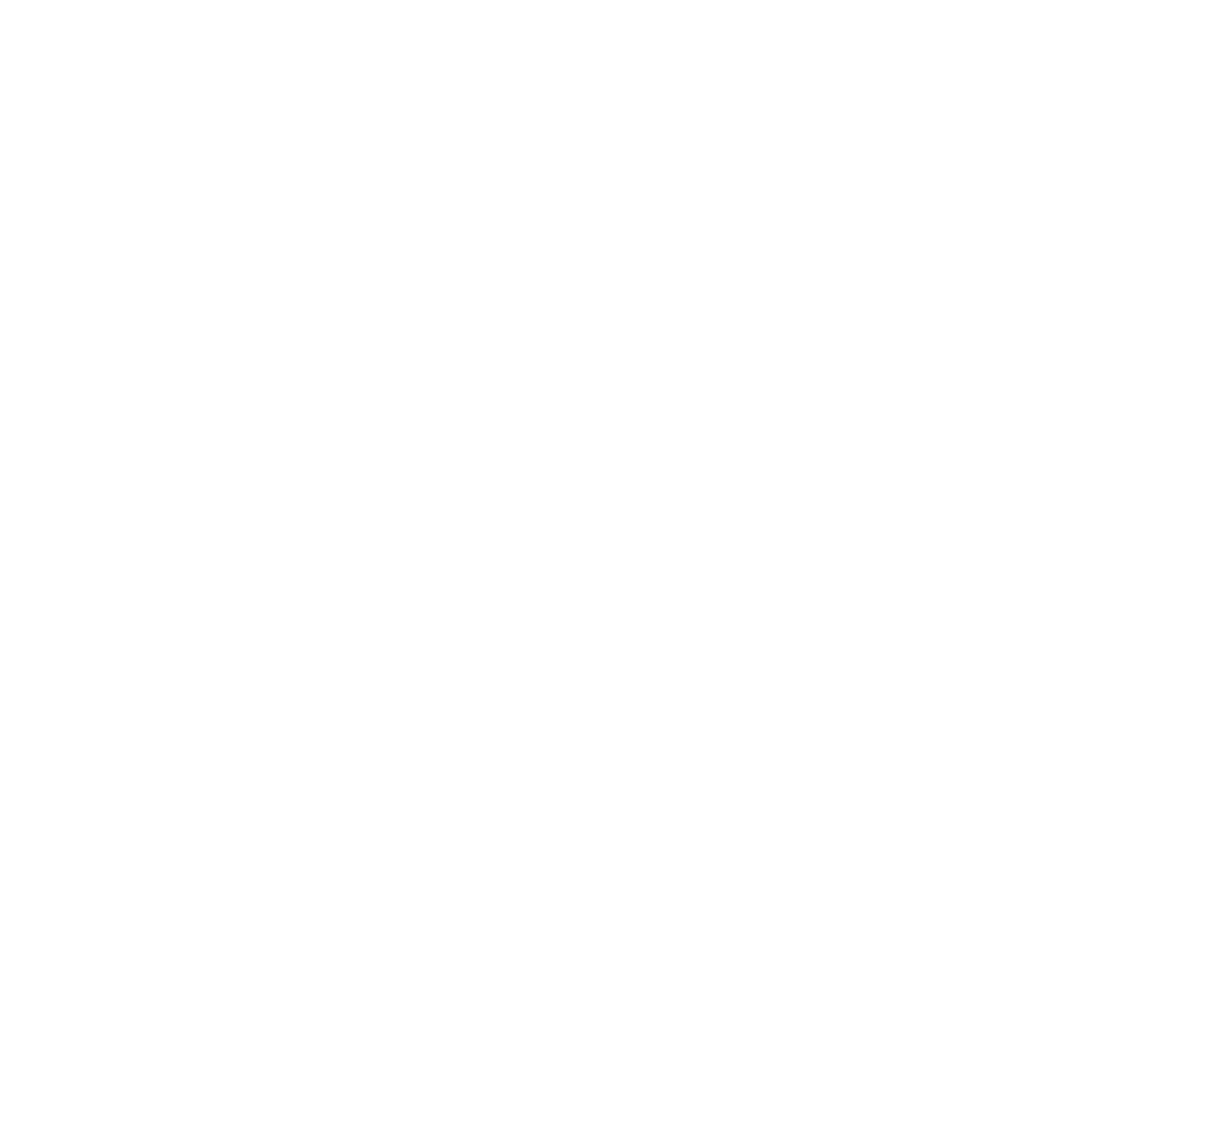 k-letter